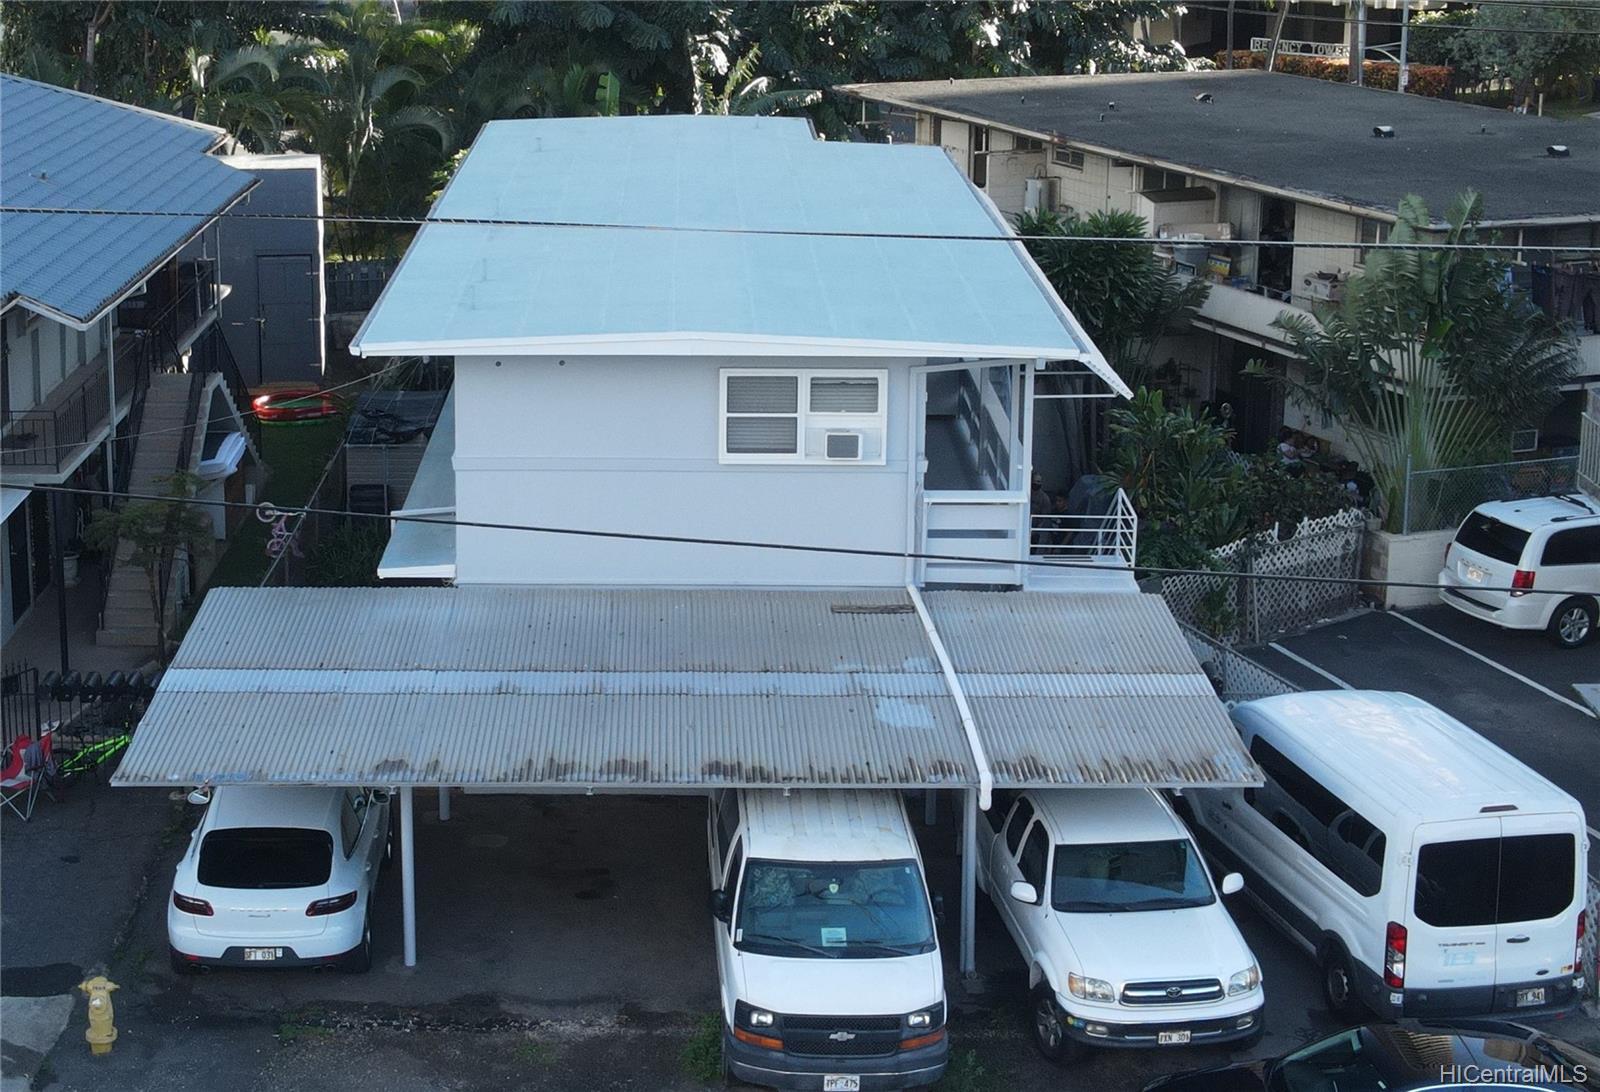 2521 Kapiolani Blvd Honolulu - Multi-family - photo 14 of 17